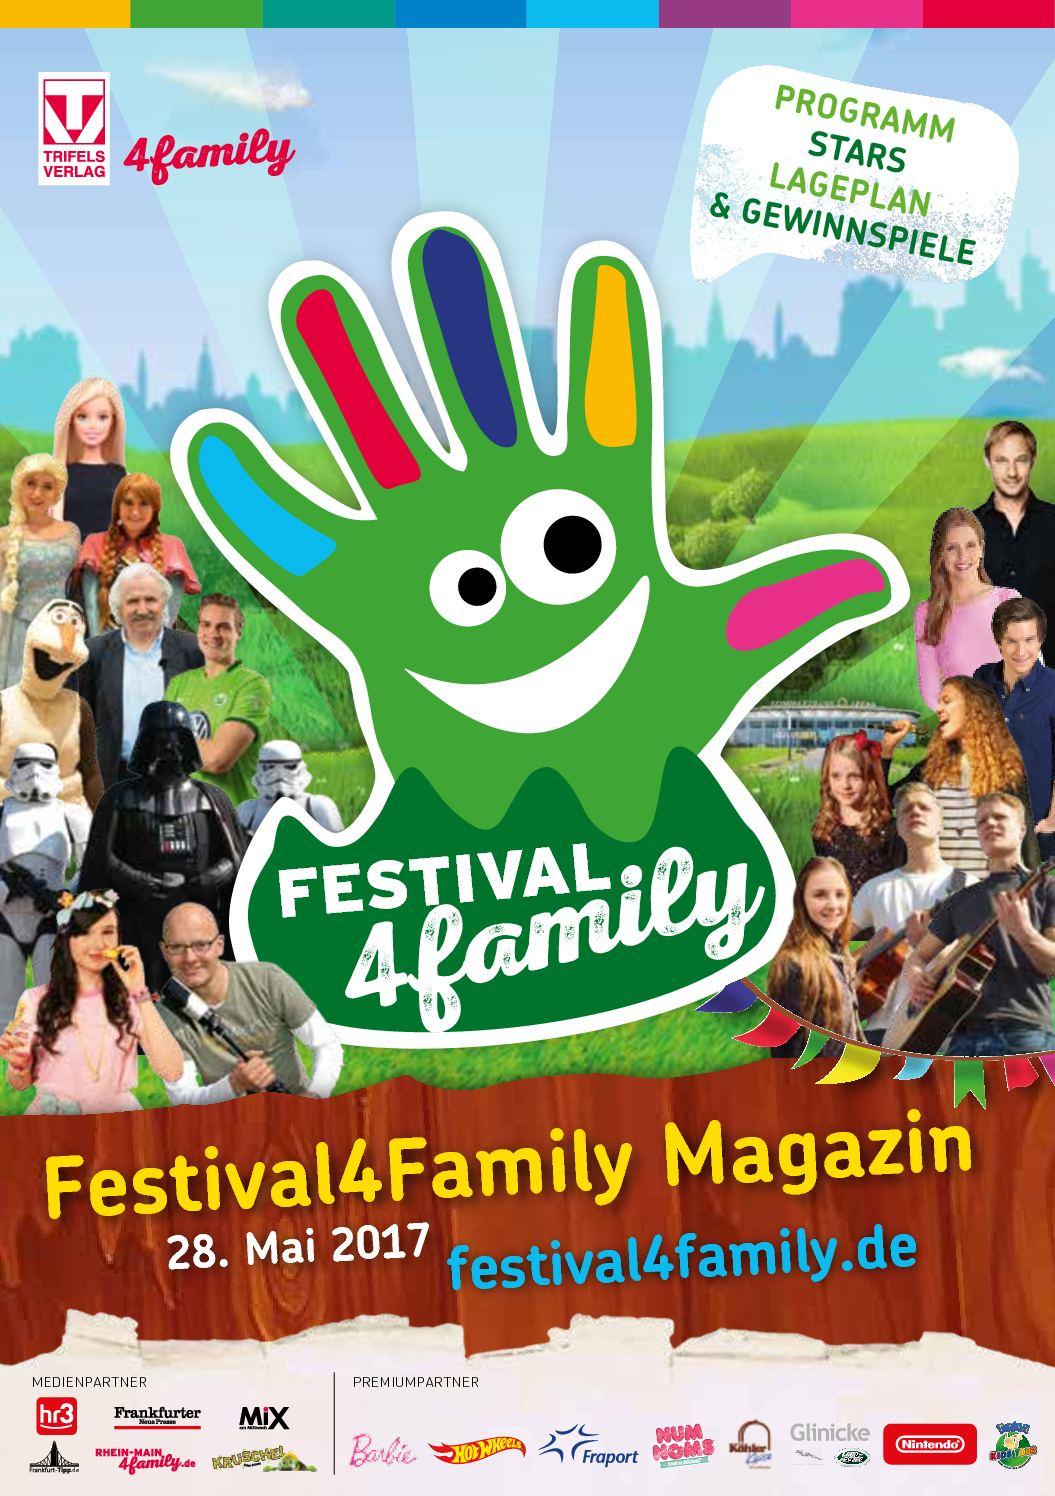 Calaméo Festival4family Magazin 2017